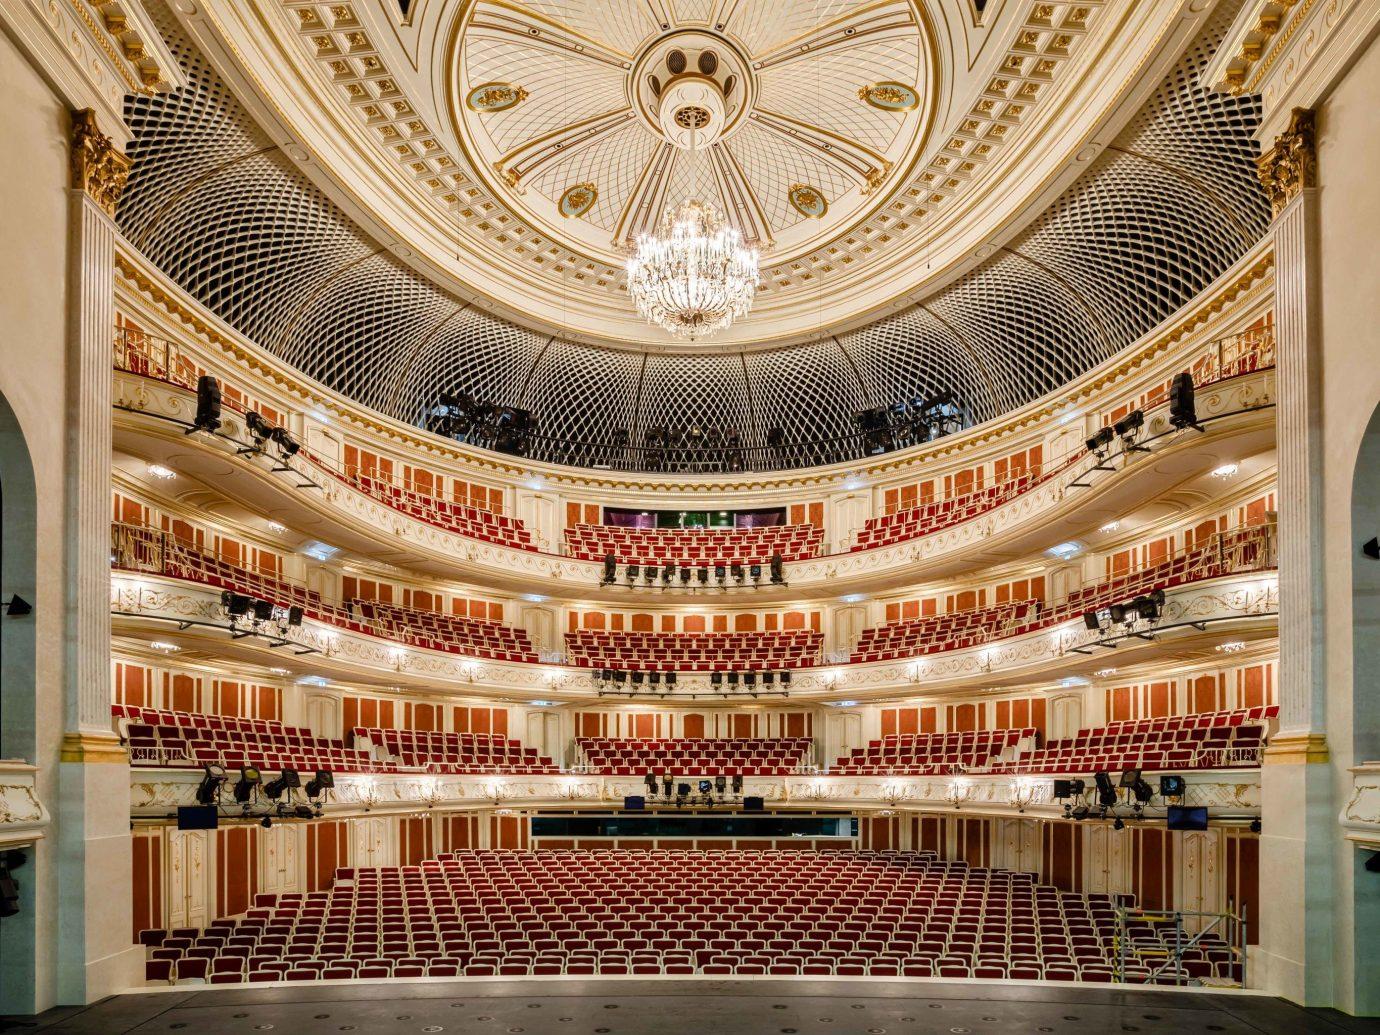 europe Trip Ideas opera house theatre concert hall ceiling performing arts center auditorium interior design symmetry building